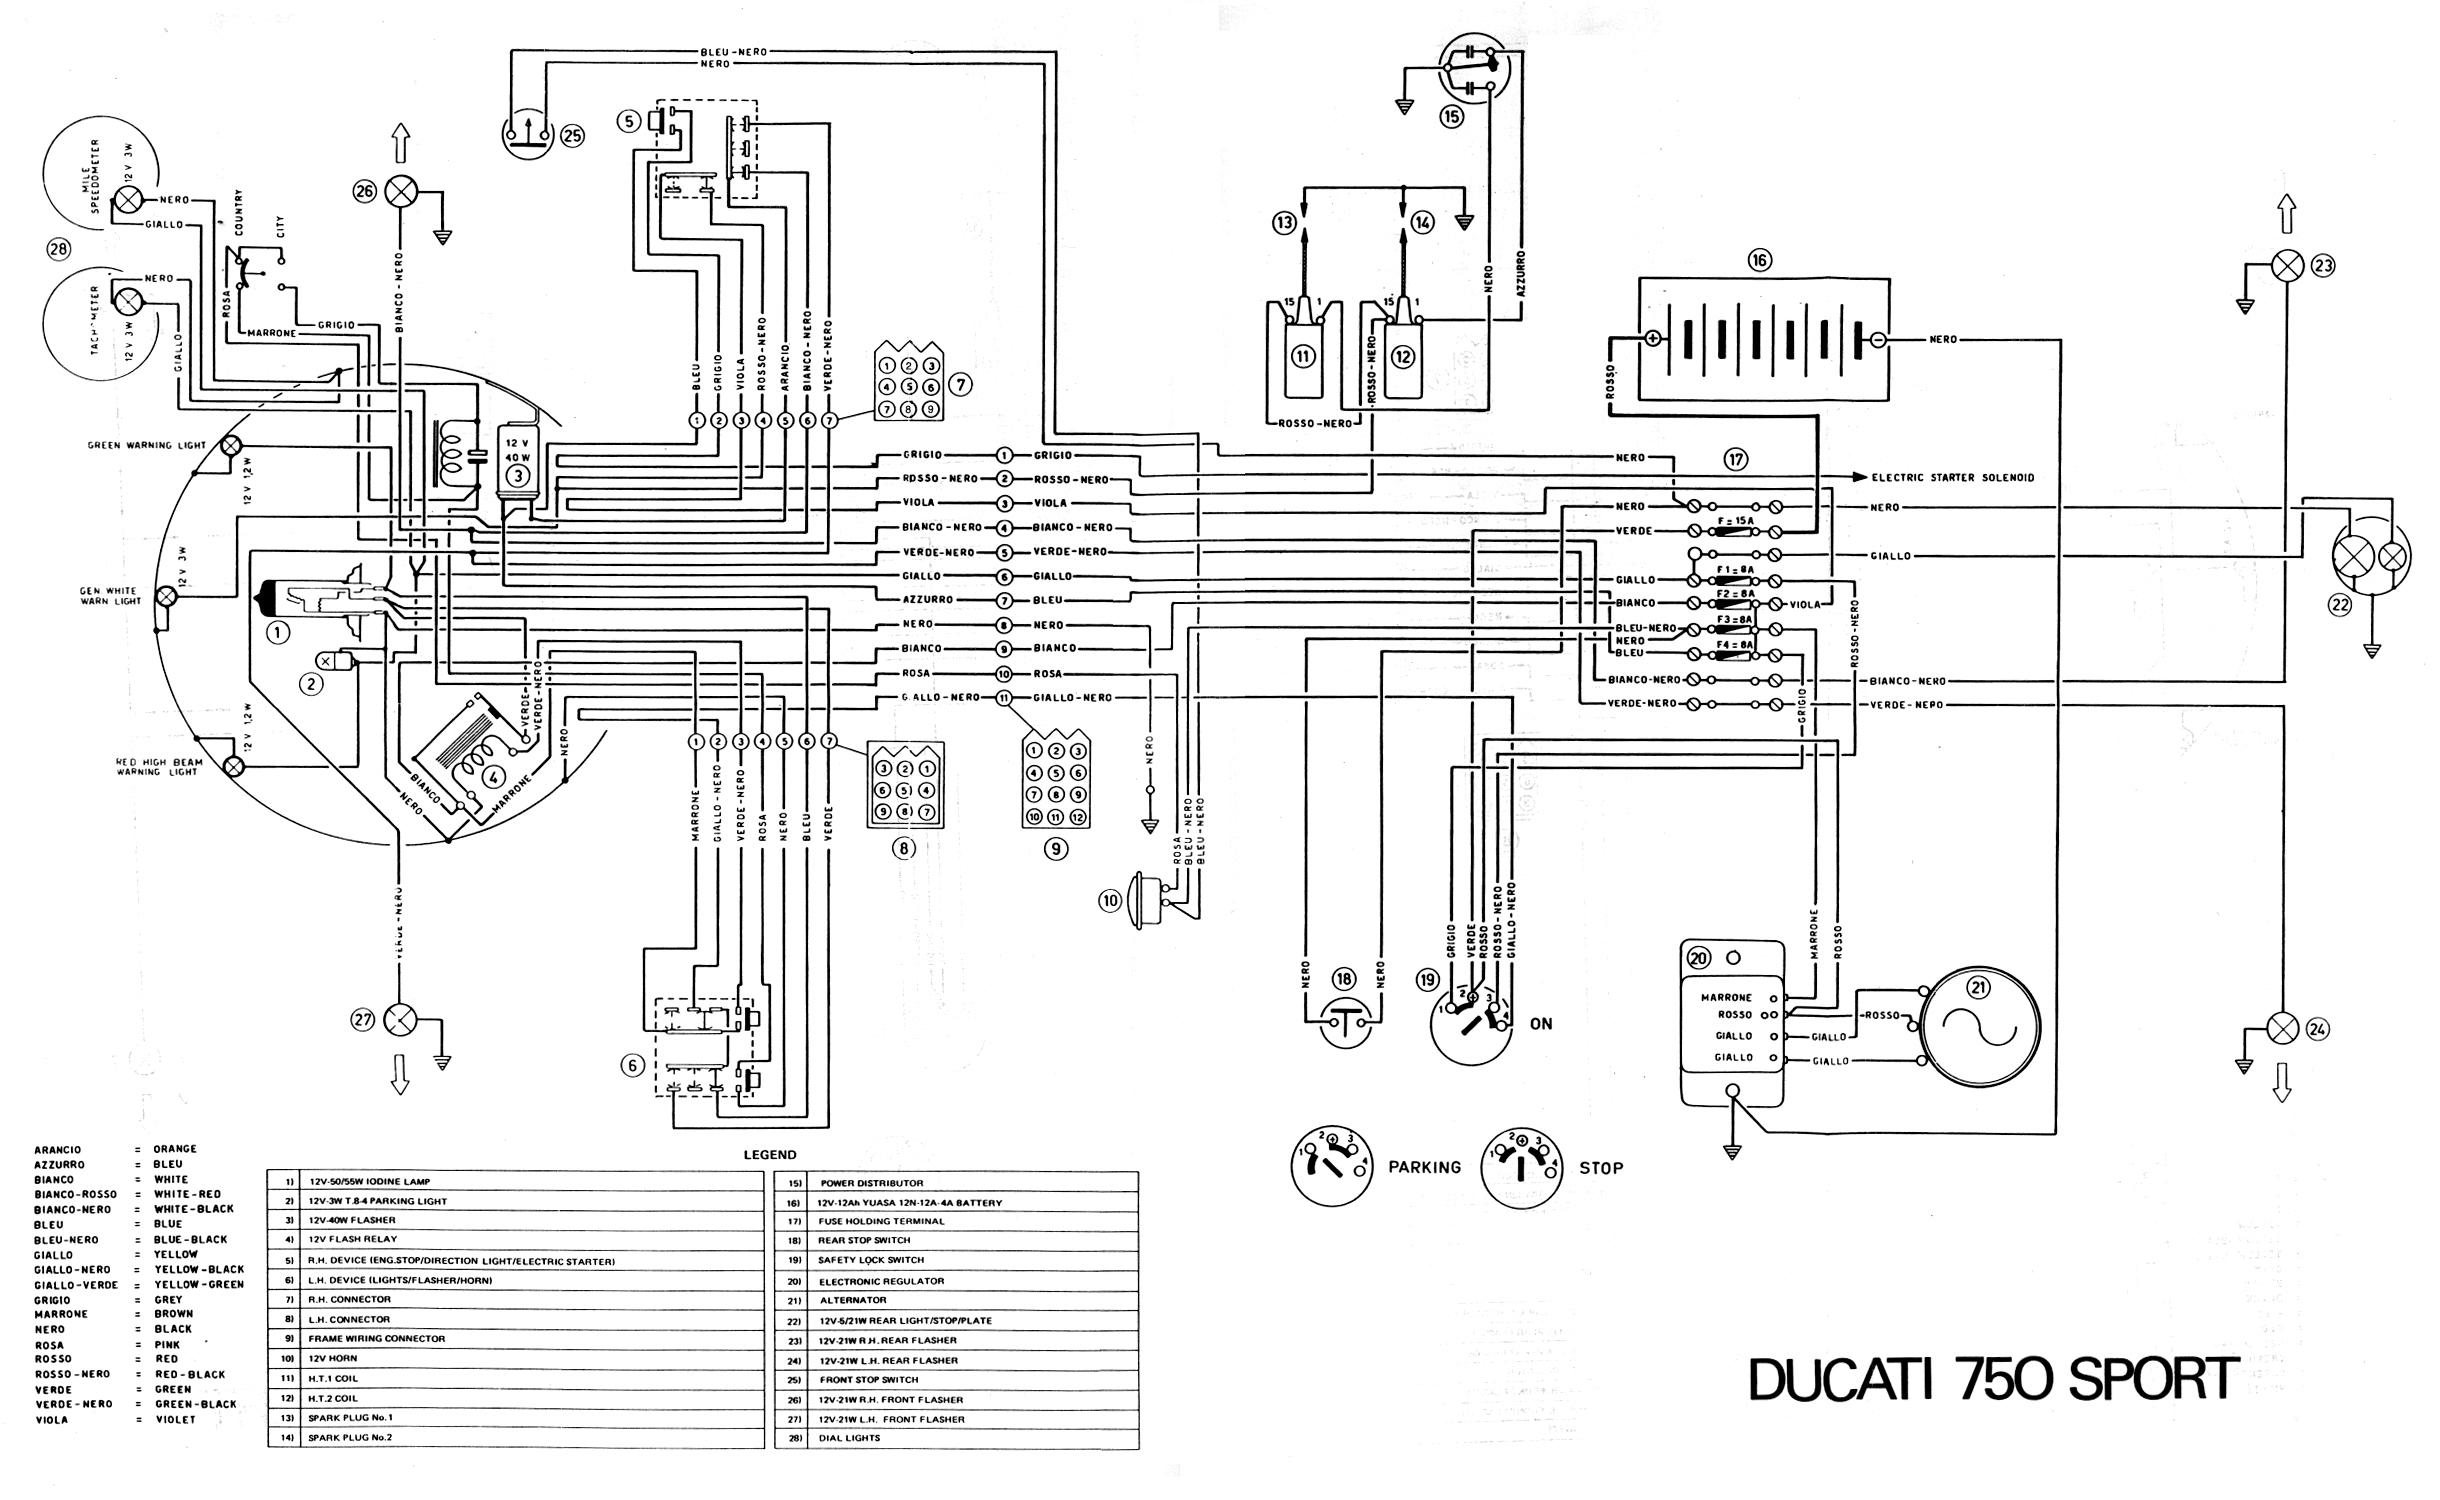 Kubota M6800 Wiring Diagram Within Kubota Wiring And